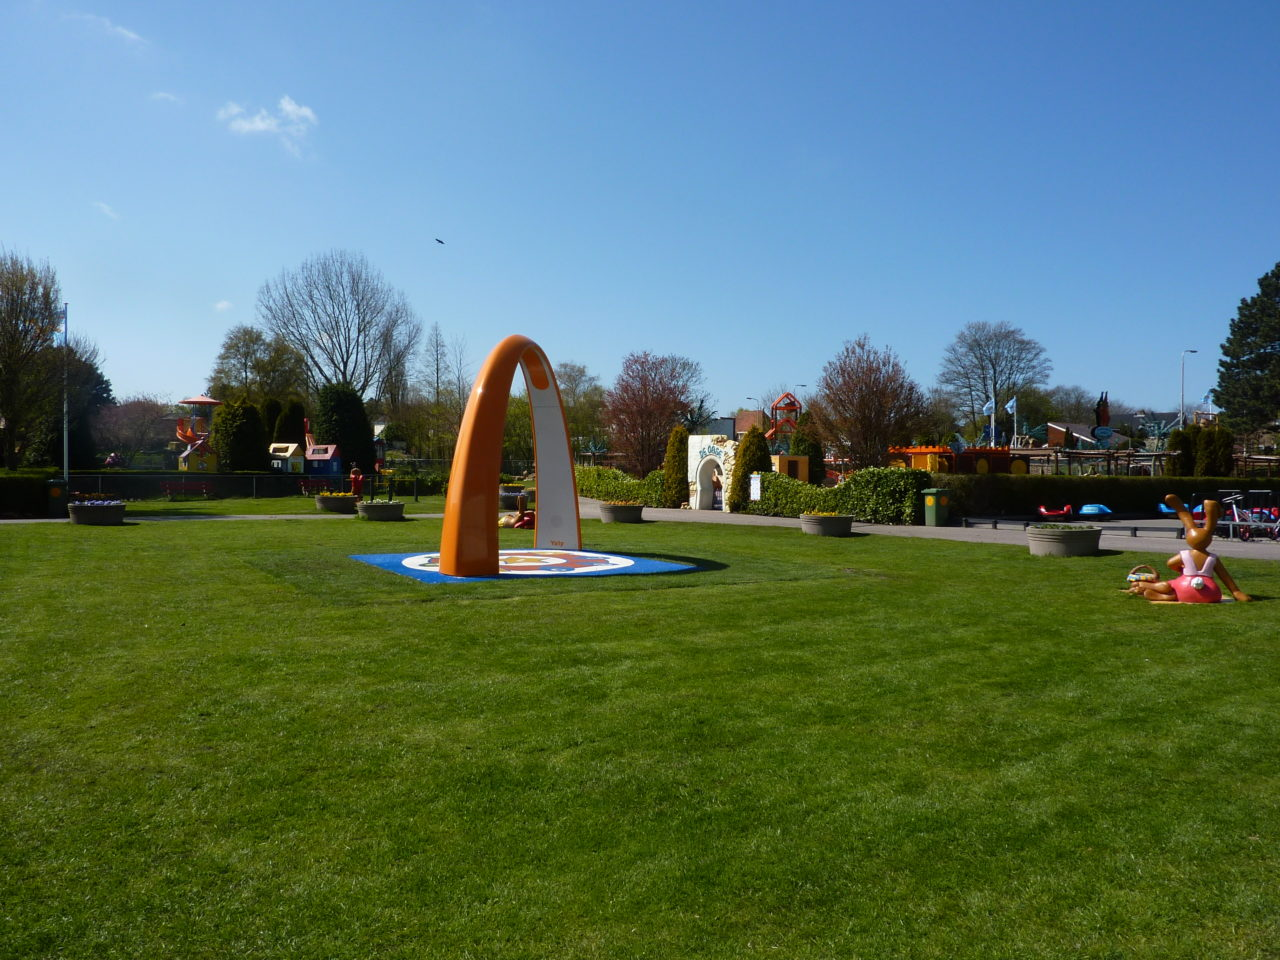 Yalp Sona - Europe's largest playground Linneaushof